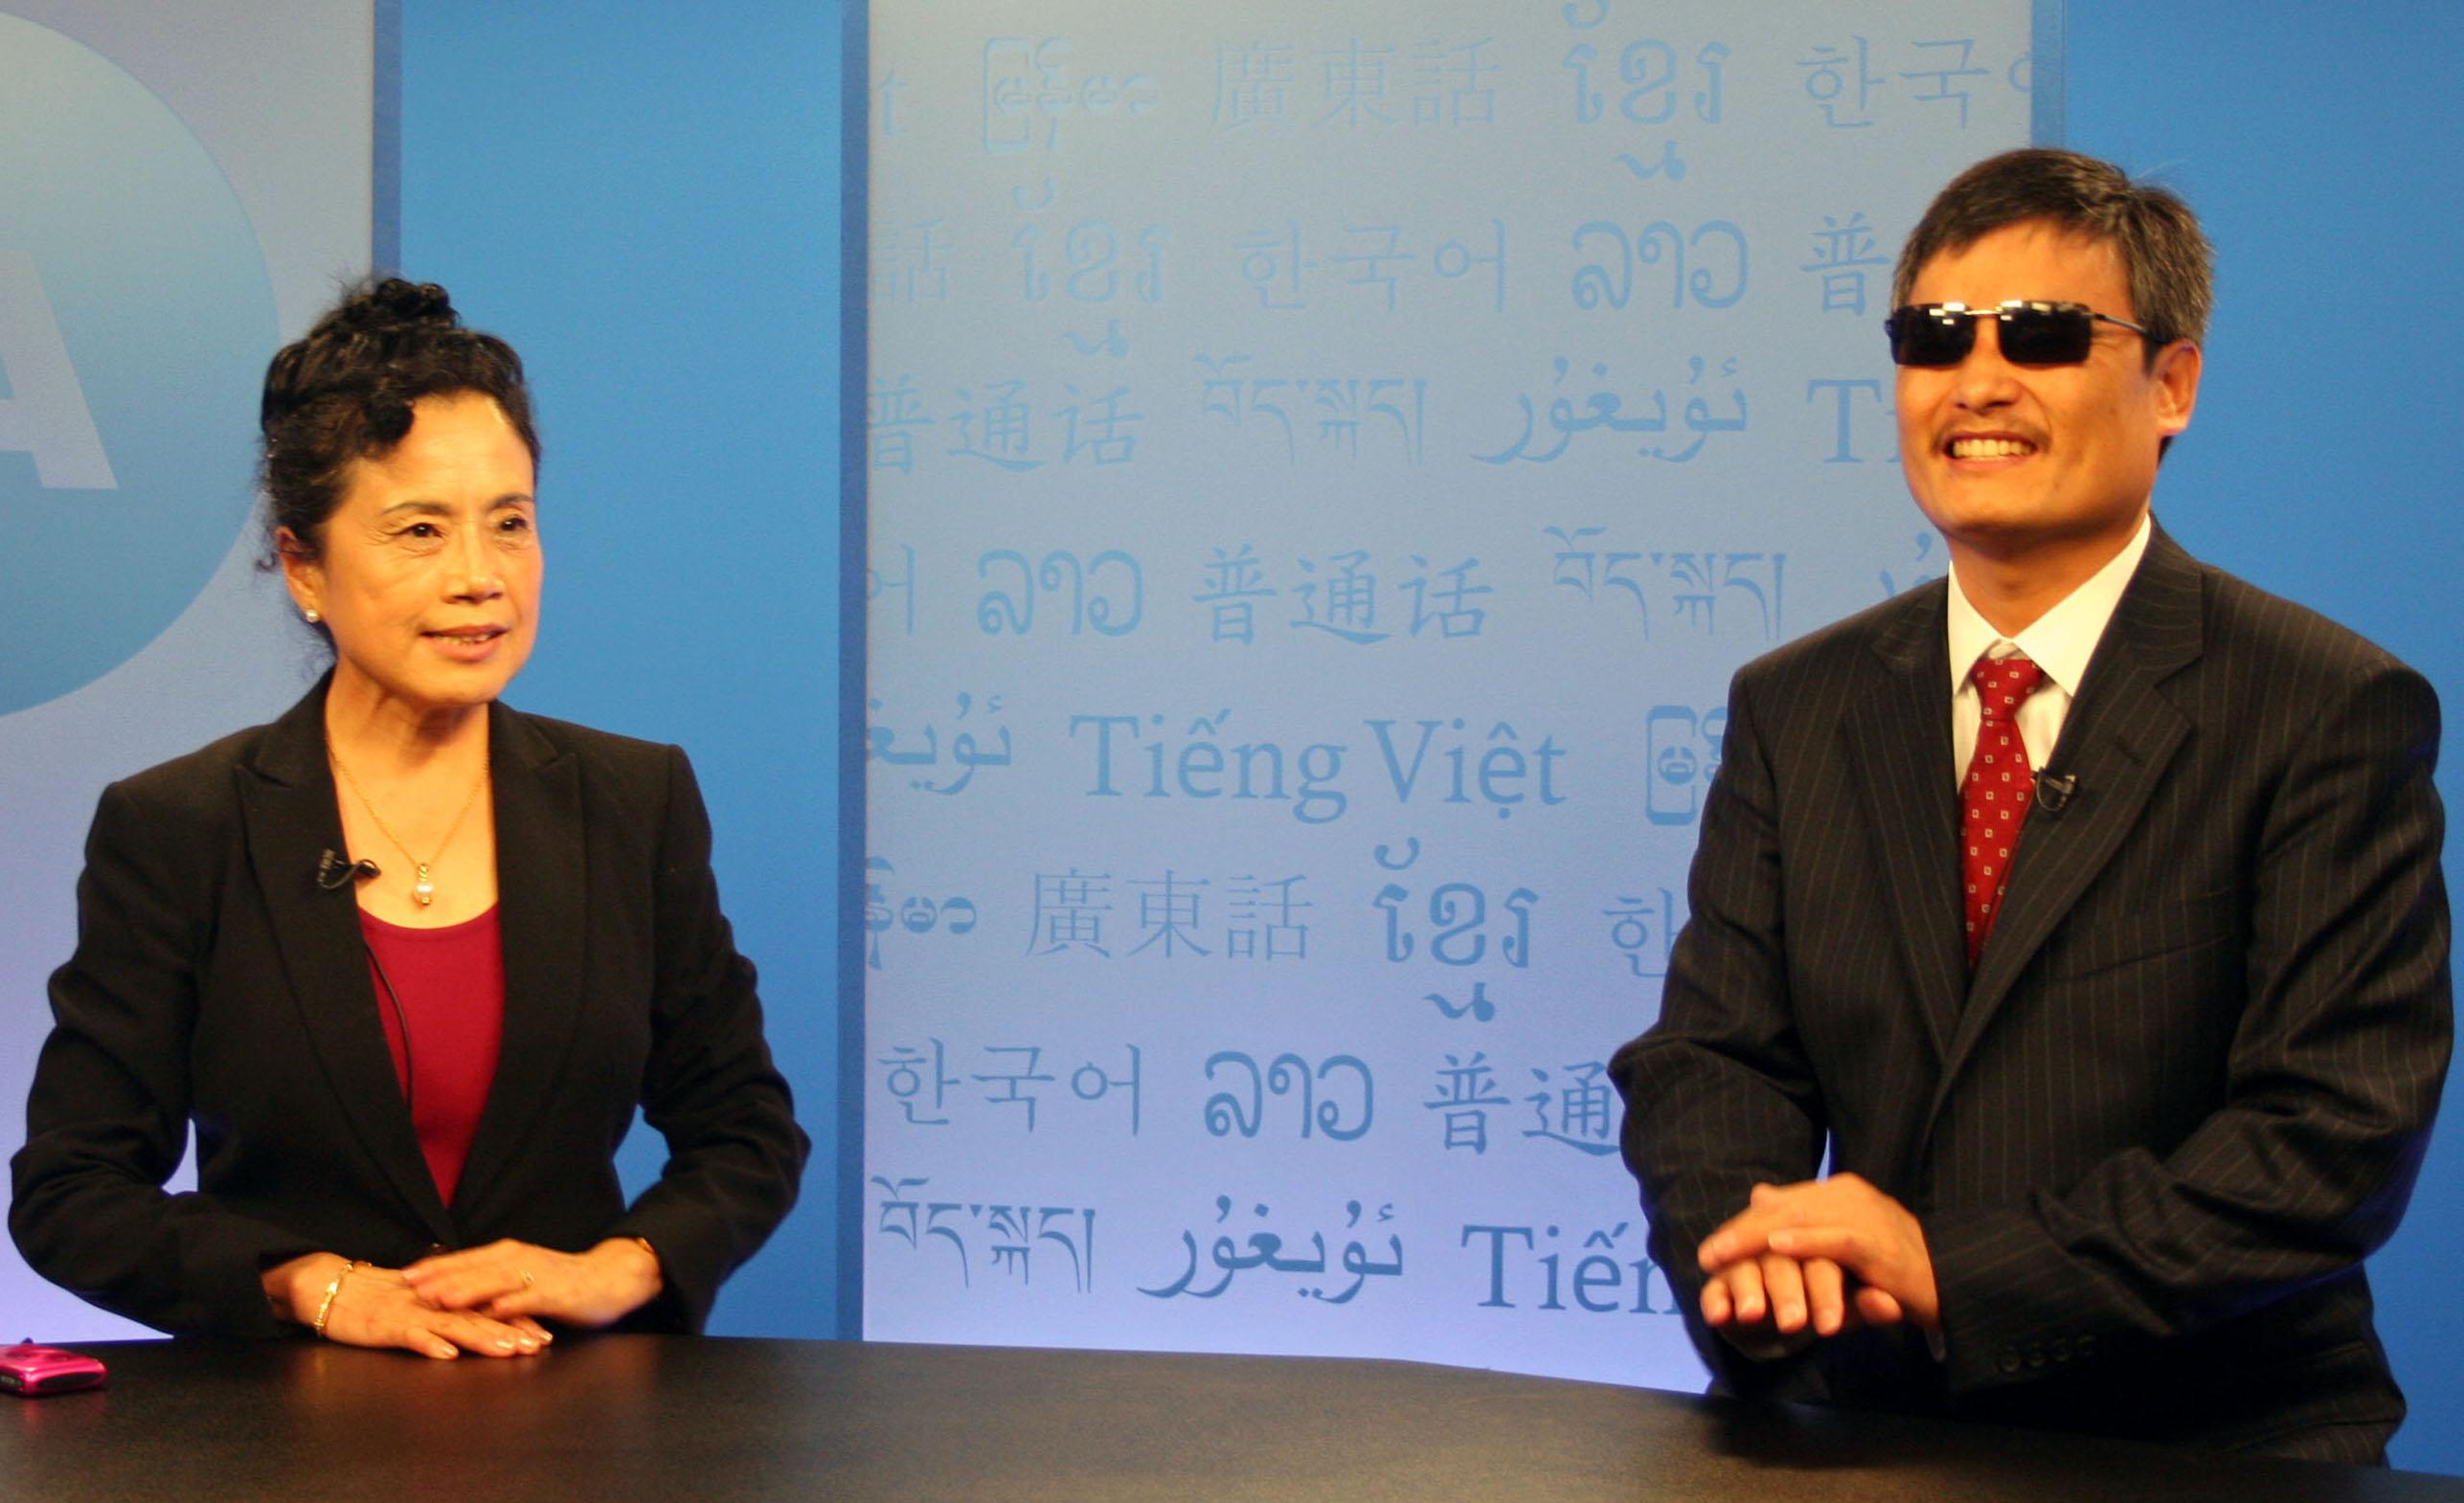 Chen Guangcheng Visits Radio Free Asia